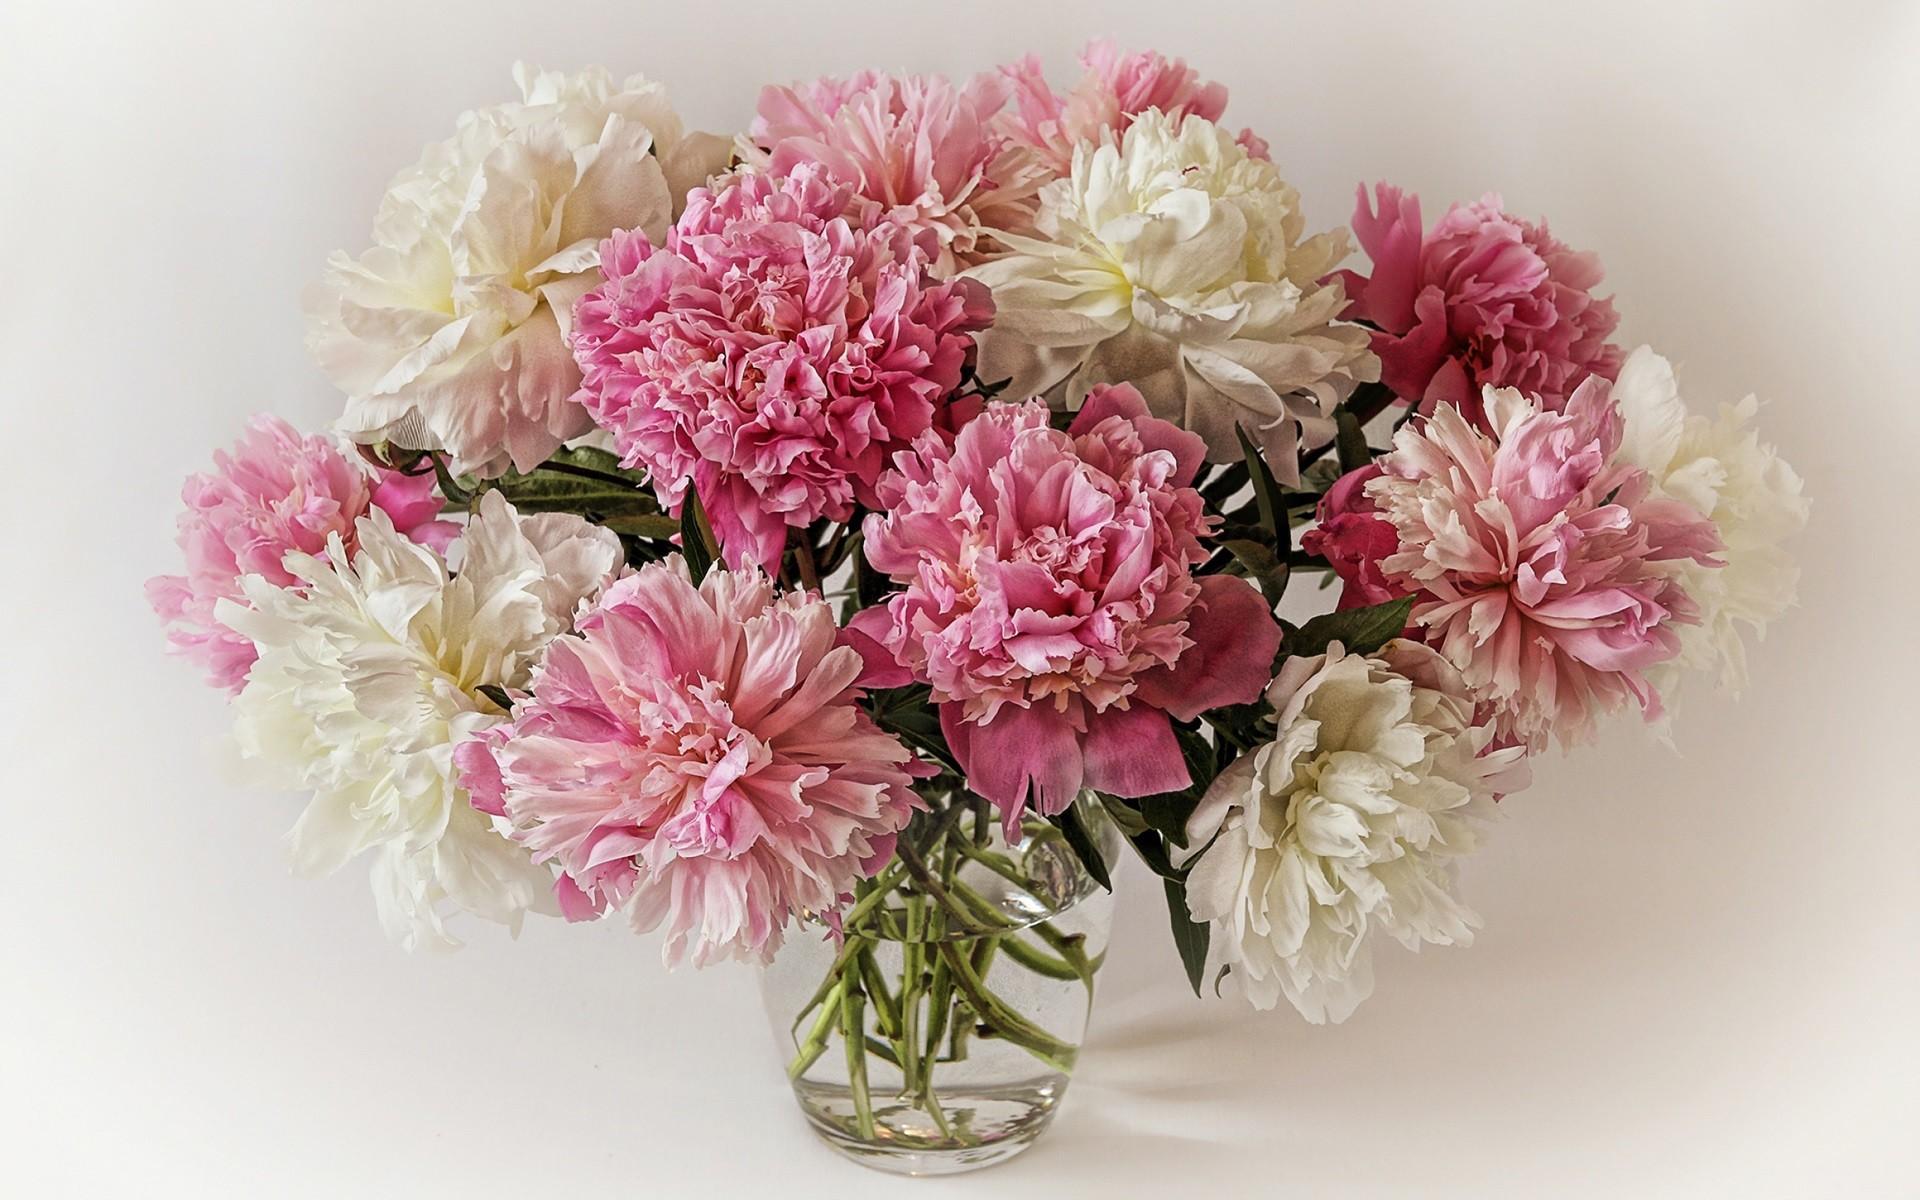 Res: 1920x1200, Download Original Wallpaper Category:flowers ...